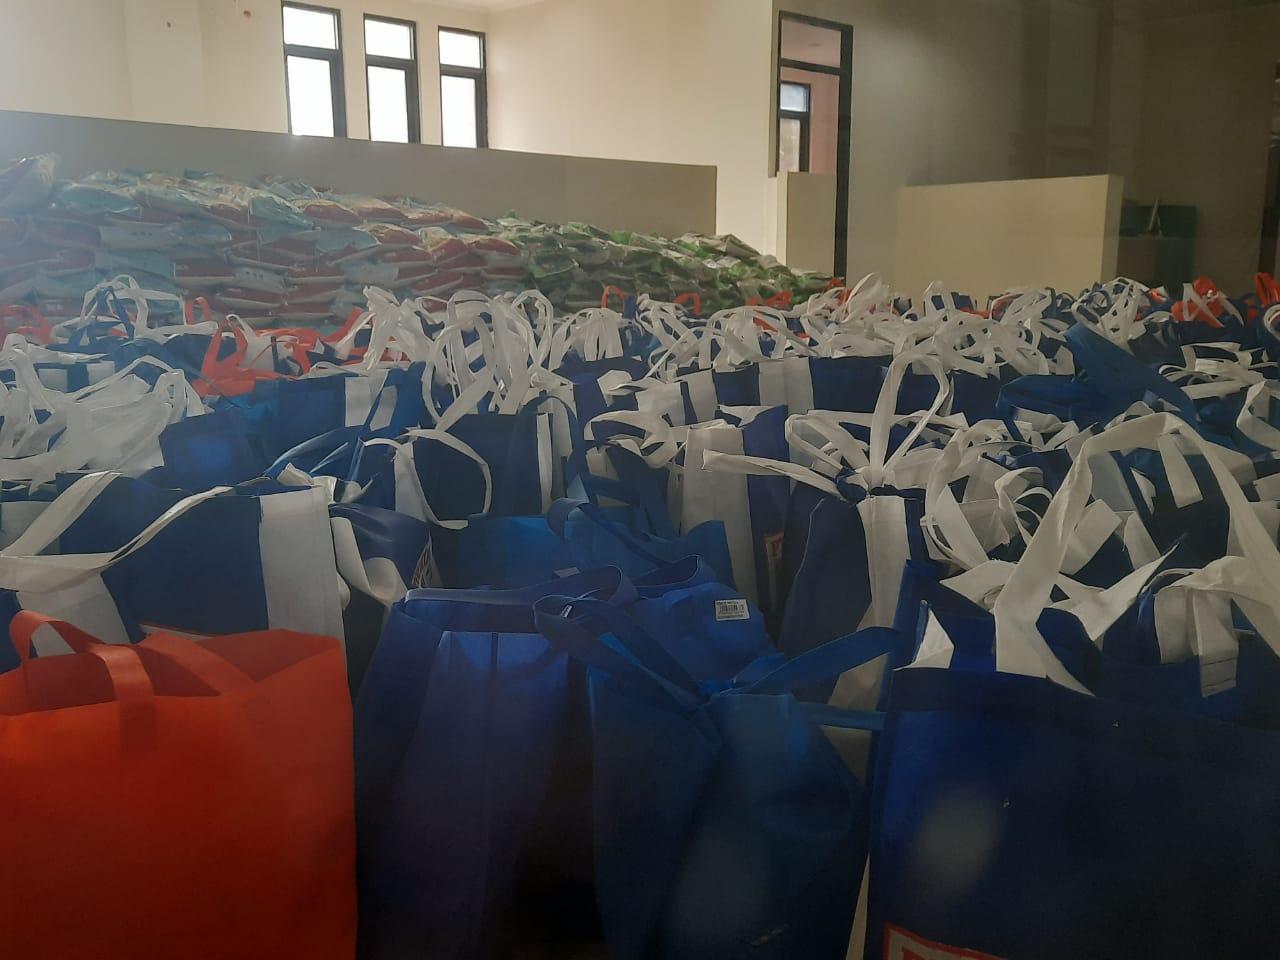 Peduli Dampak Covid-19, TNI/POLRI Bersama Relawan Akan Kembali Salurkan 1.200 Sembako